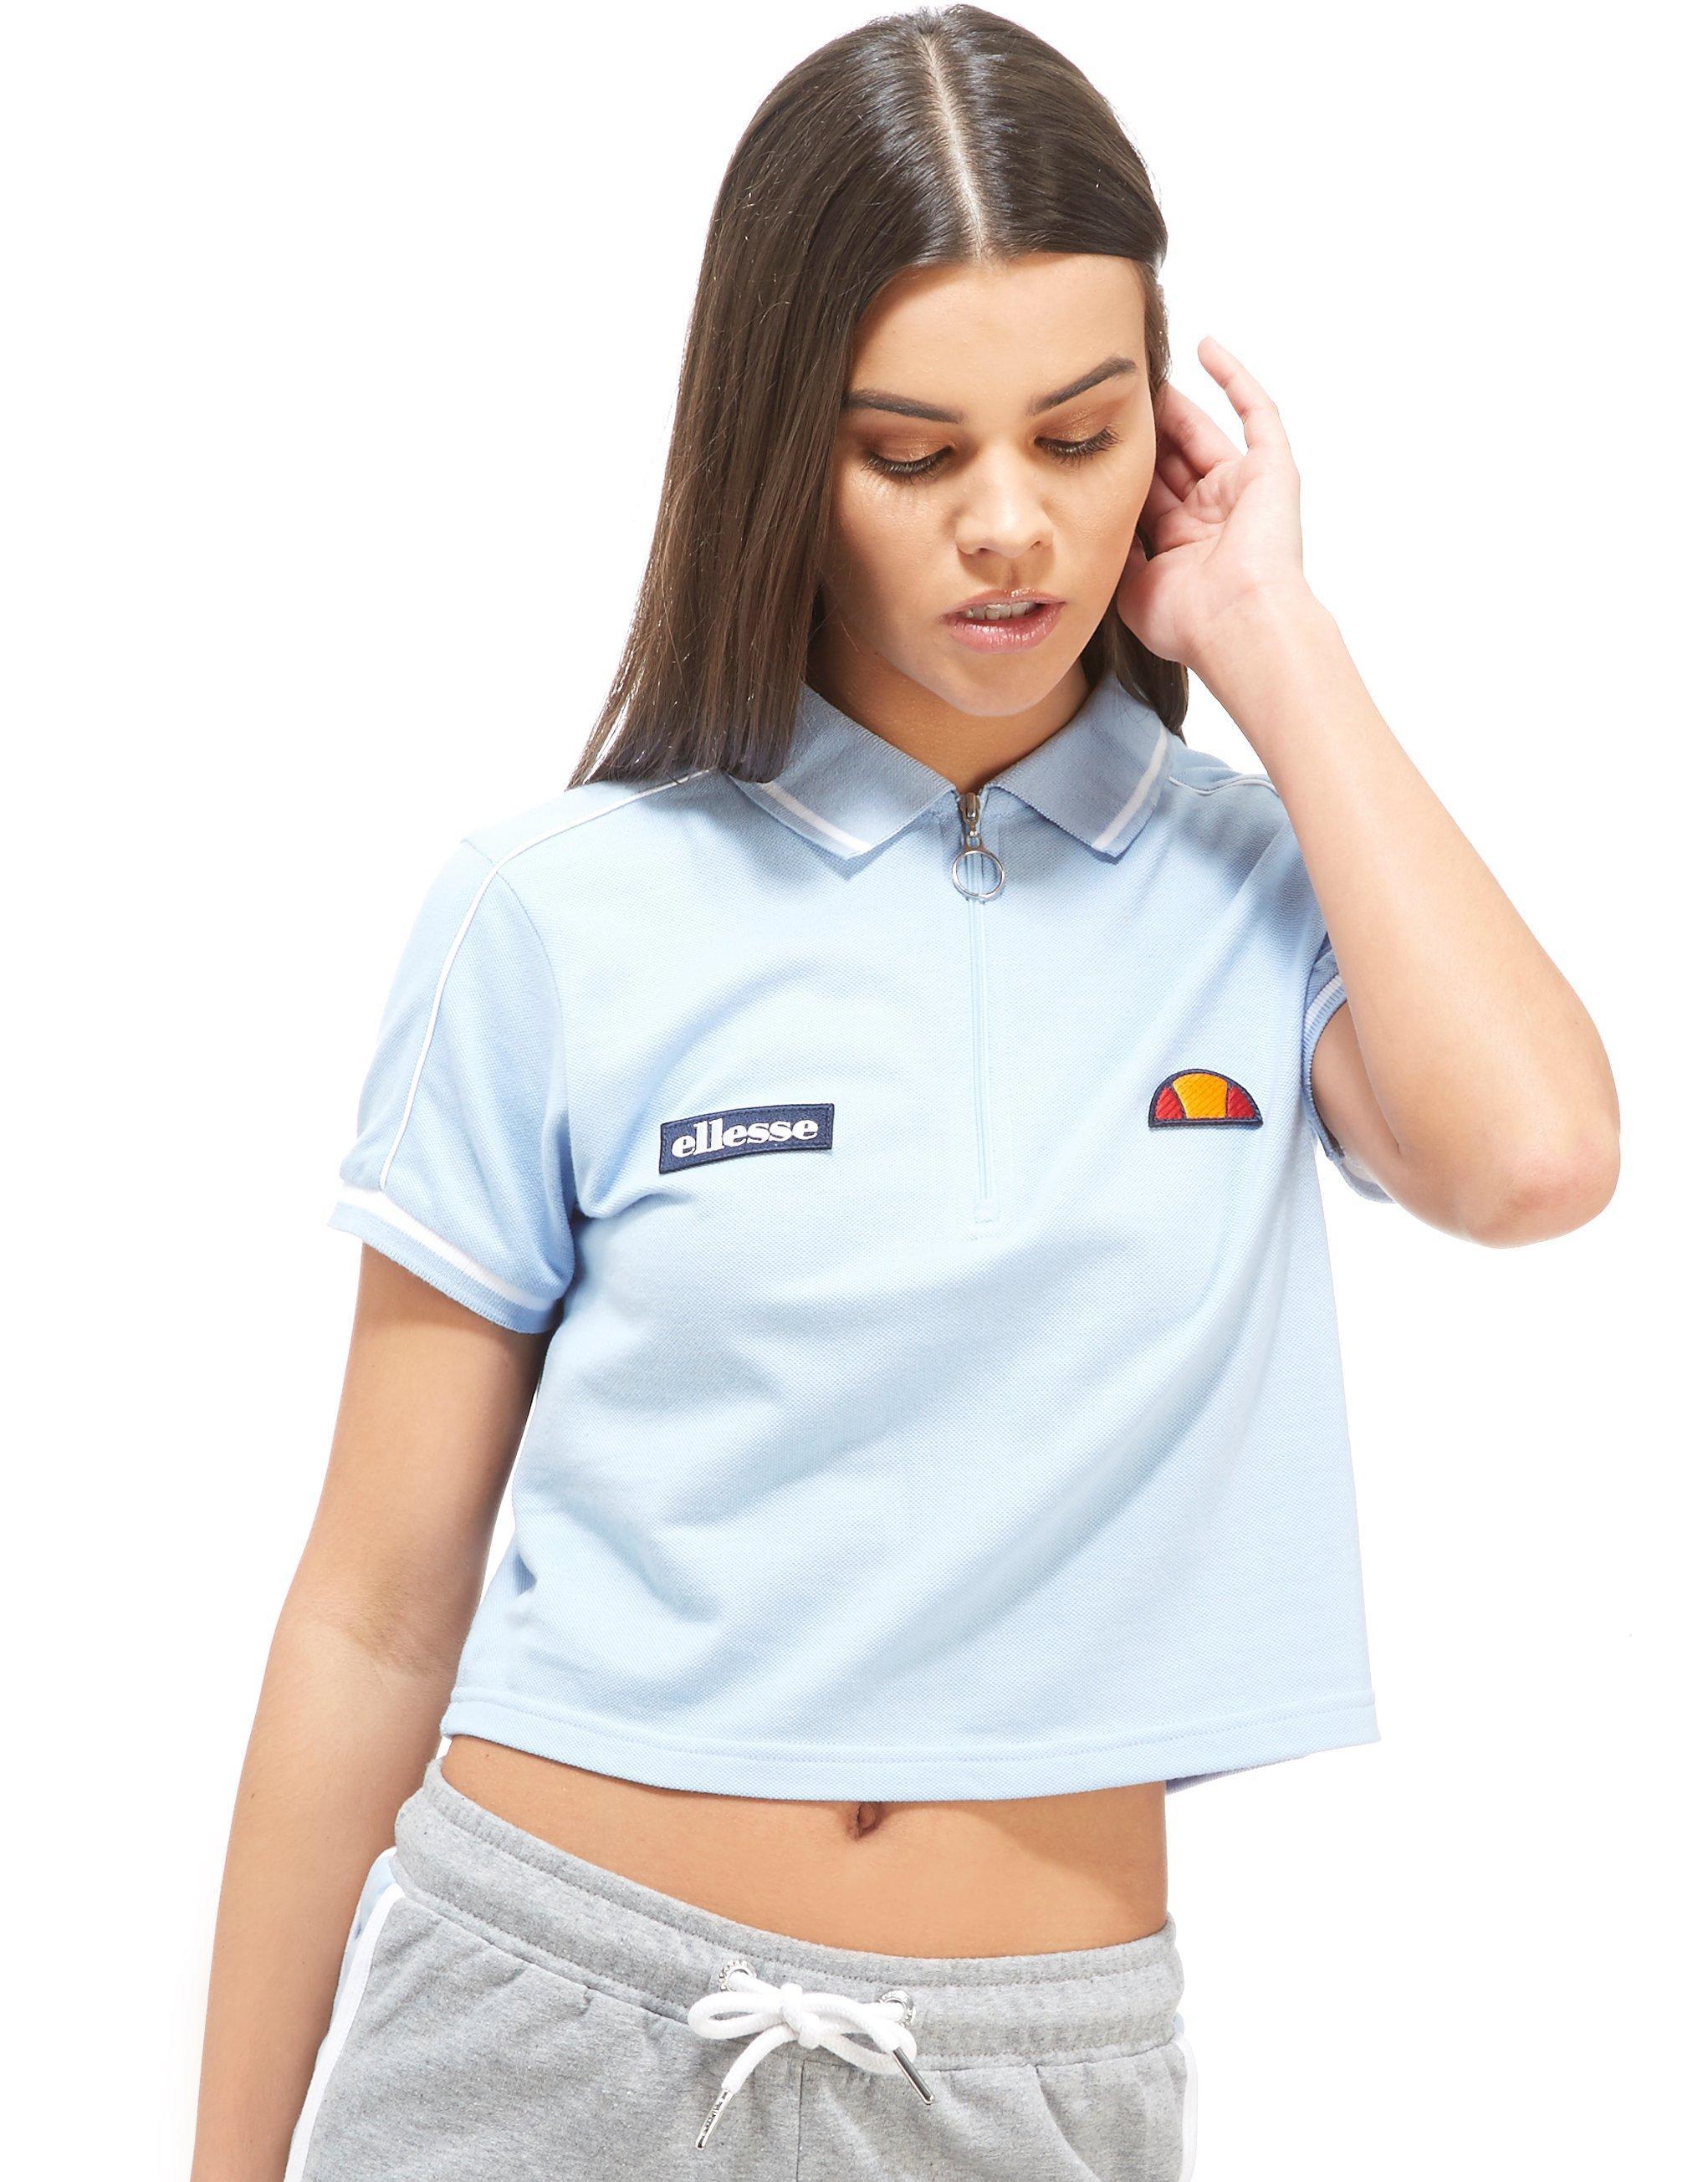 c86ff52024e Ellesse Crop Zip Polo Shirt in Blue - Lyst